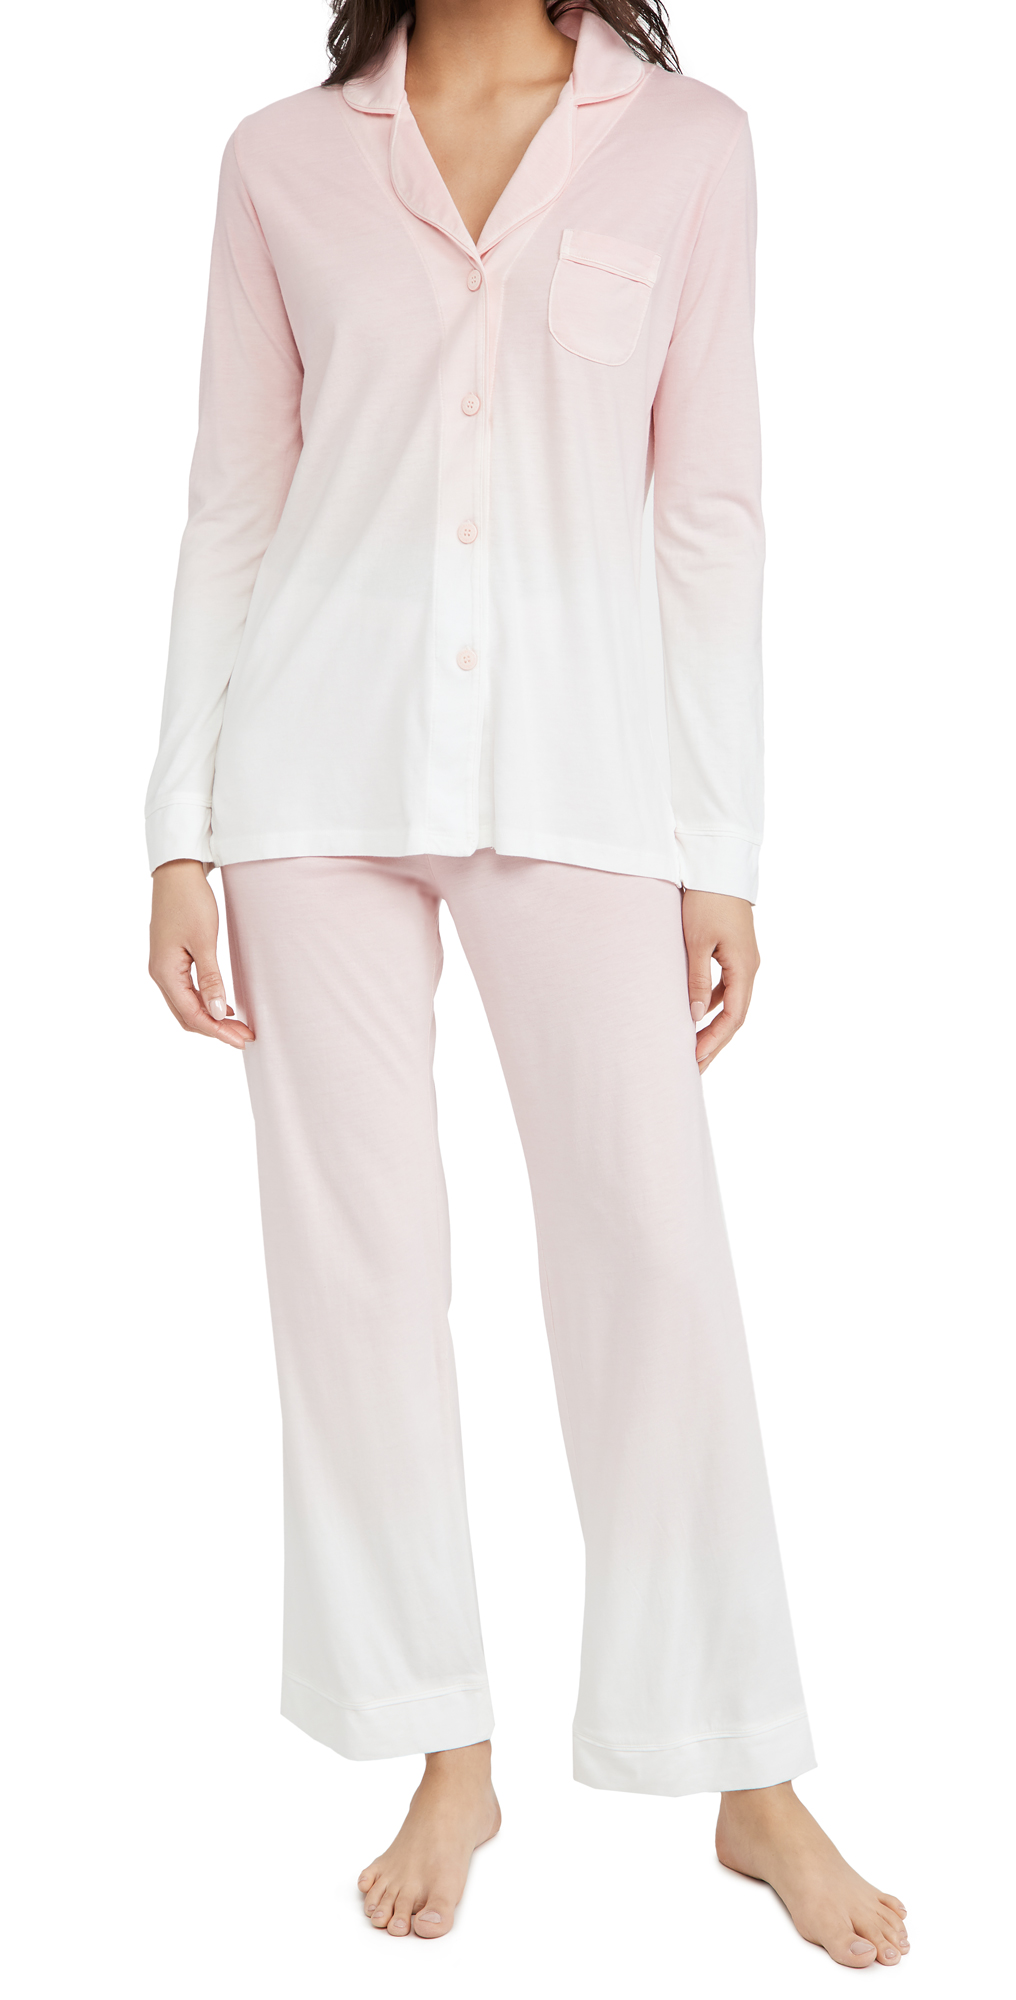 Cosabella Bella Long Sleeve Pajama Set